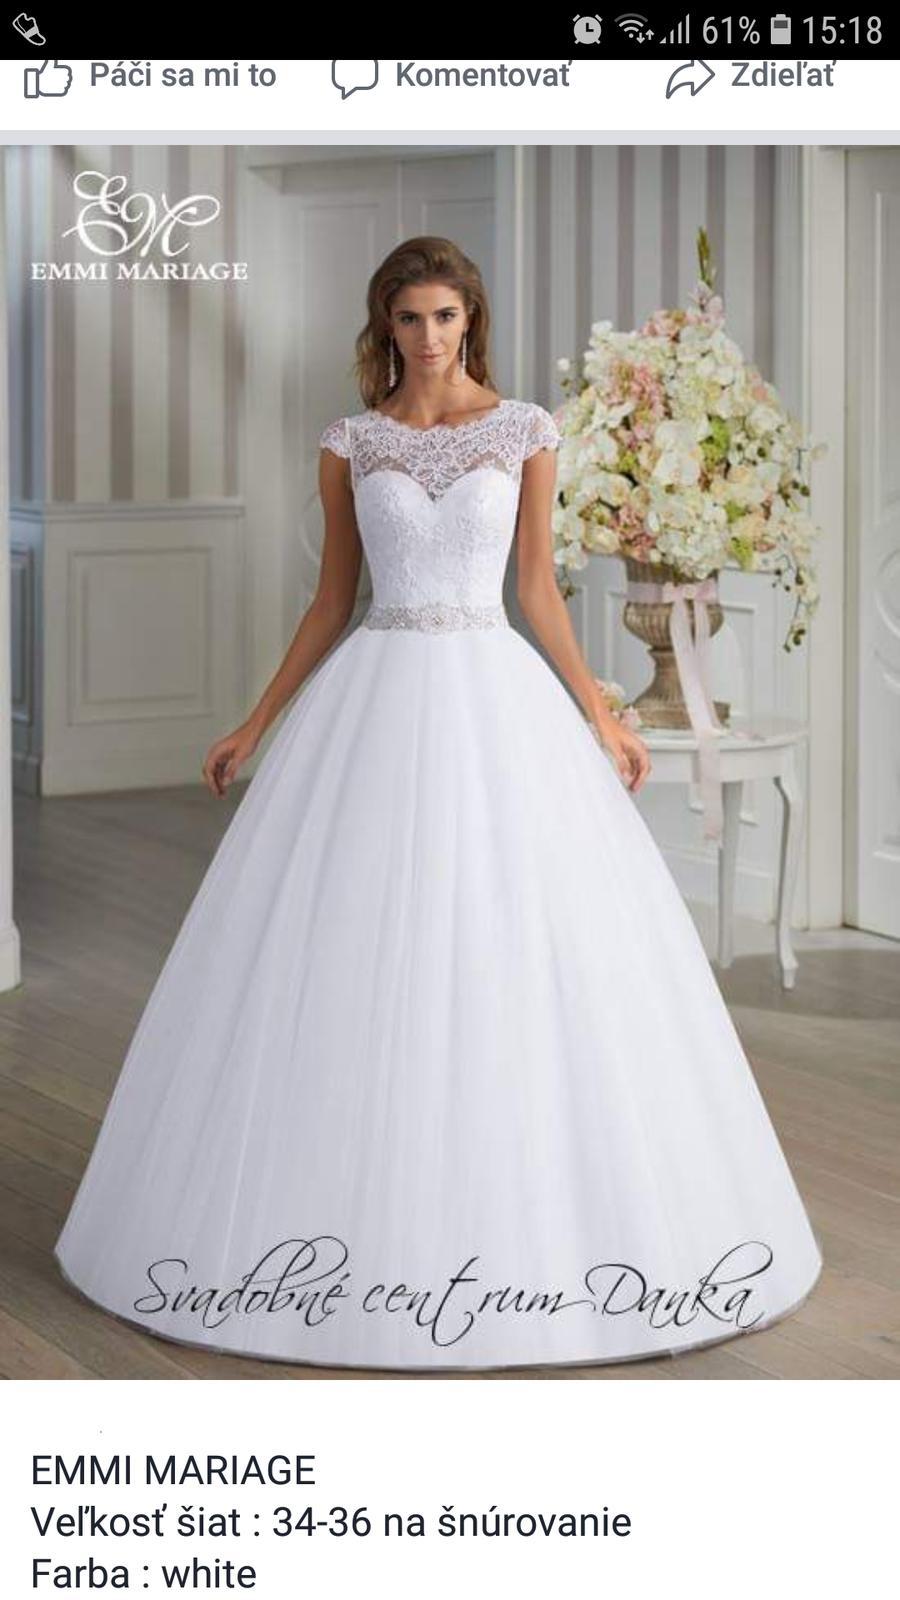 Emmi mariage svad. šaty - Obrázok č. 1